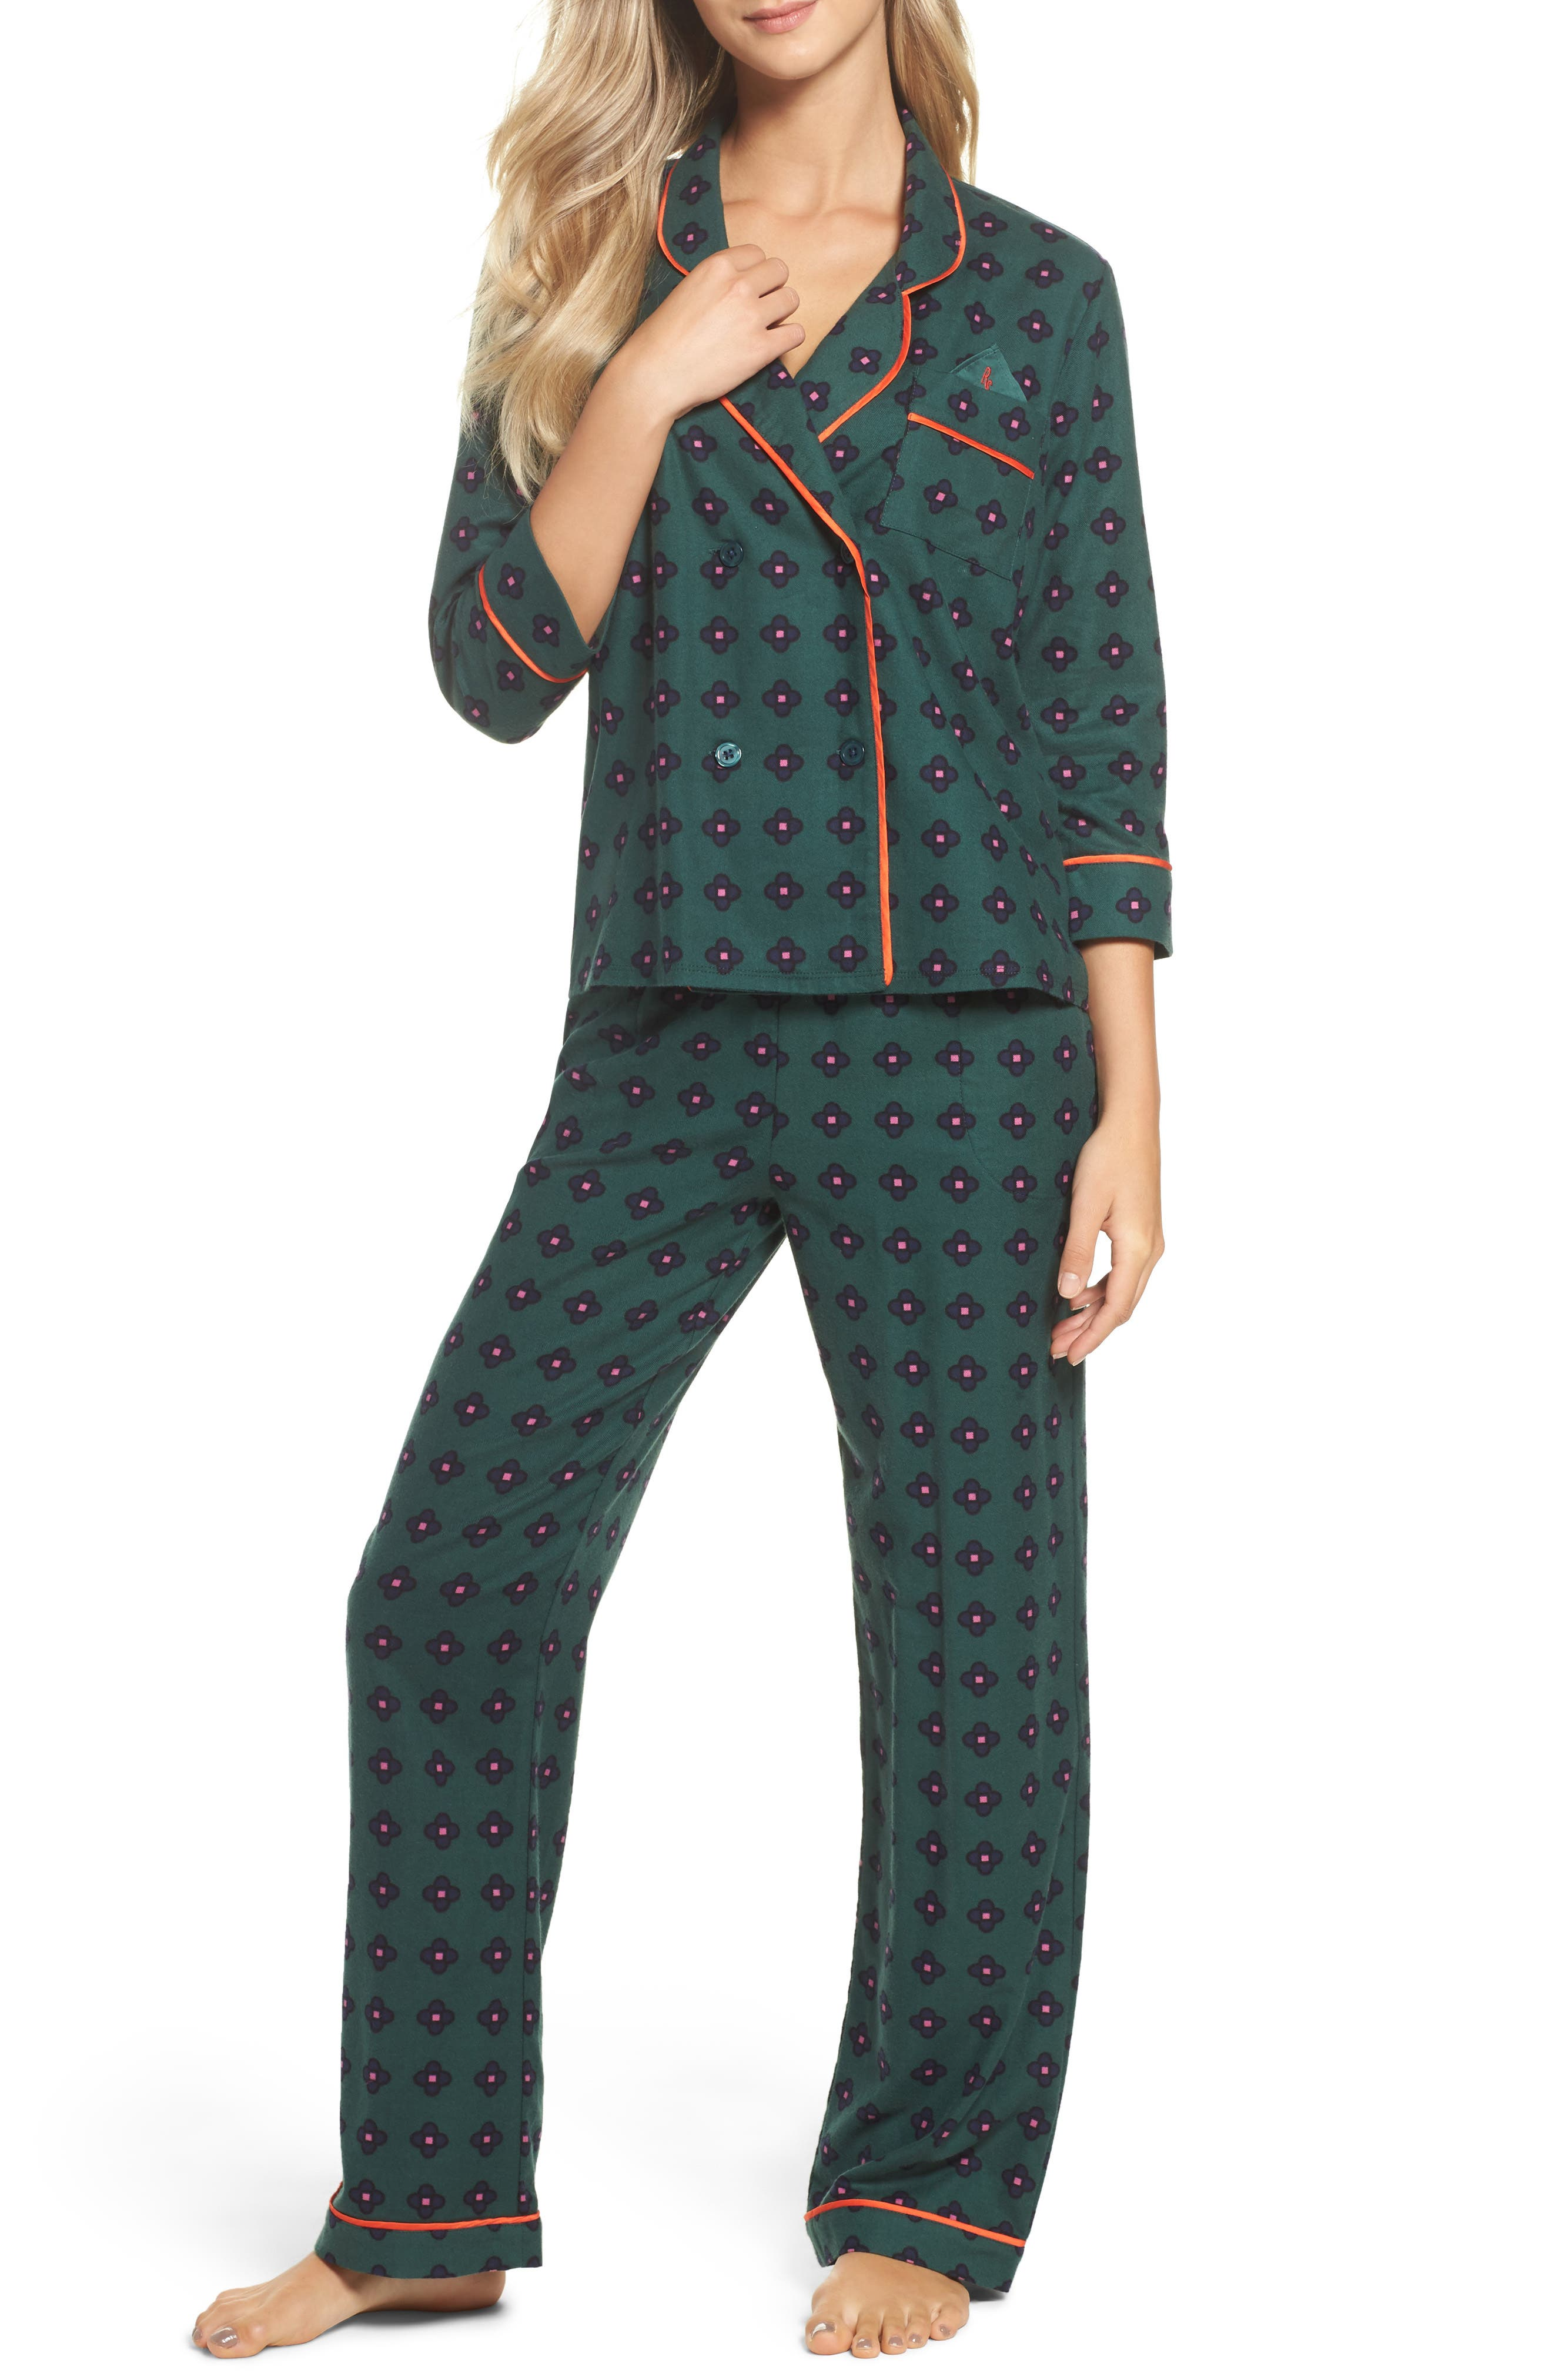 Room Service Flannel Pajamas